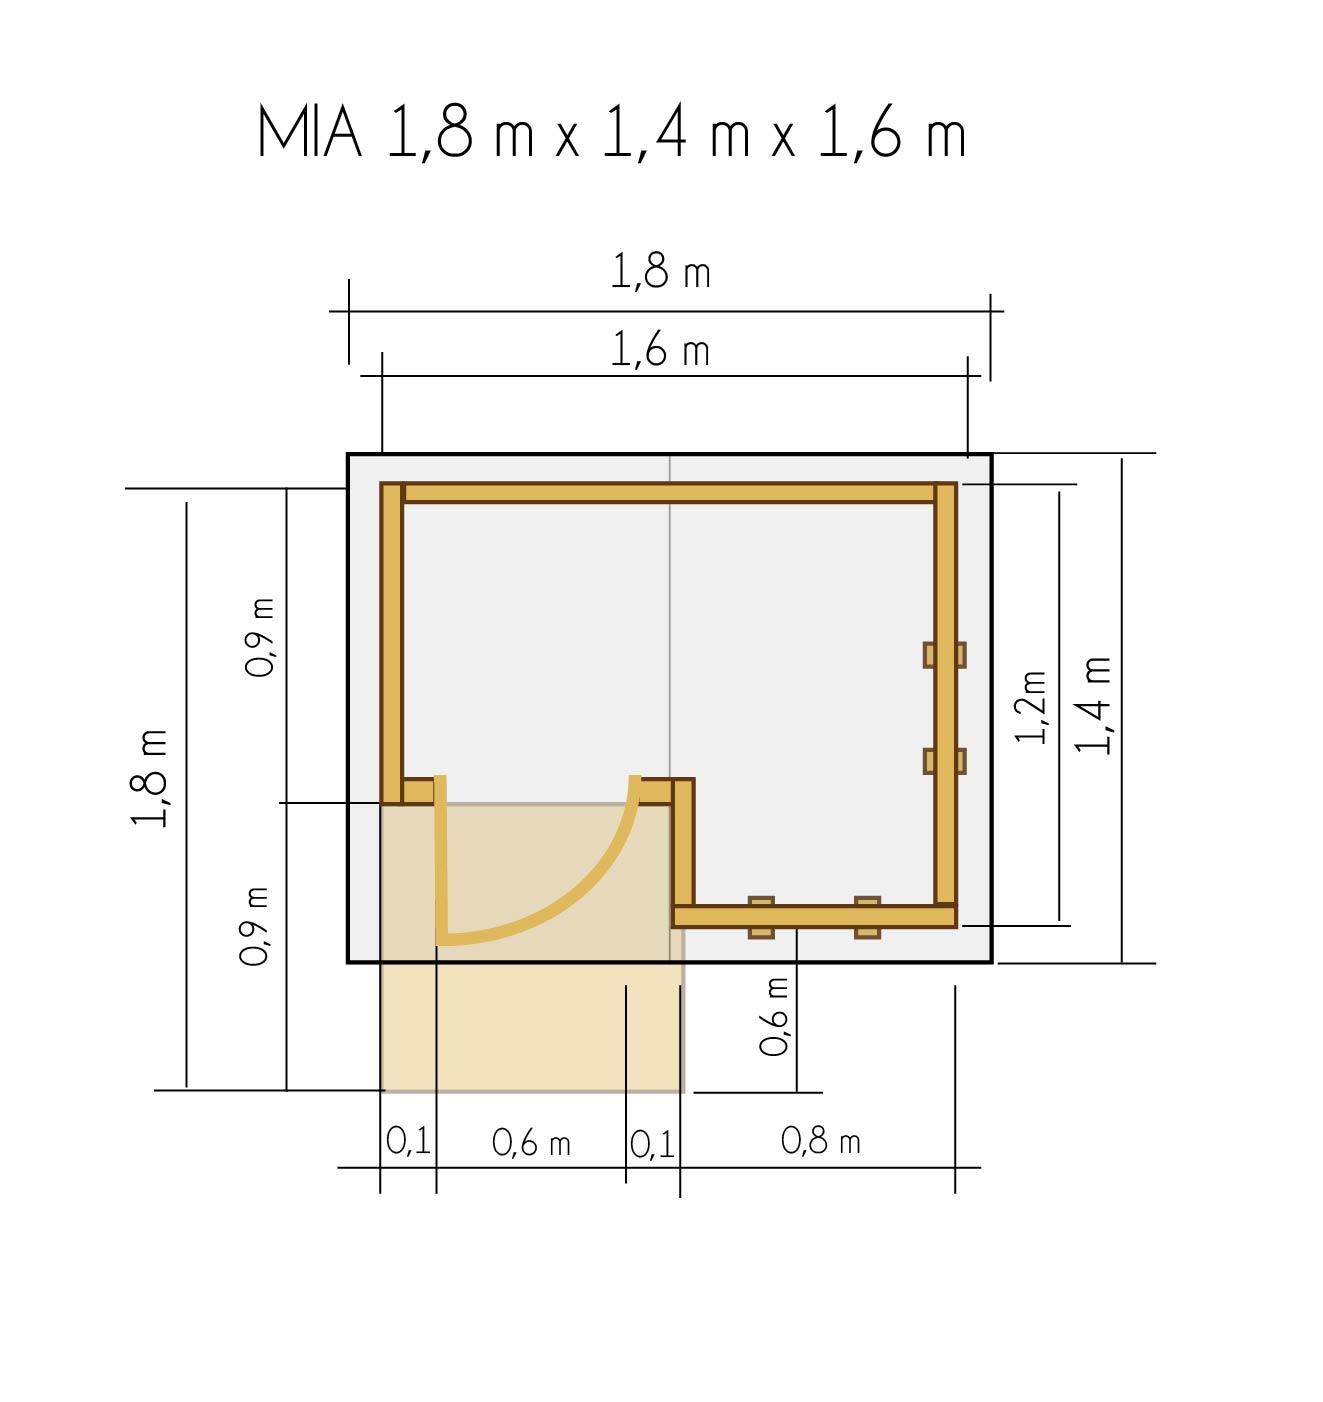 gartenh uschen f r kinder gartenh uschen f r kinder holz kinderspielhaus mia 1 8 x 1 4m. Black Bedroom Furniture Sets. Home Design Ideas